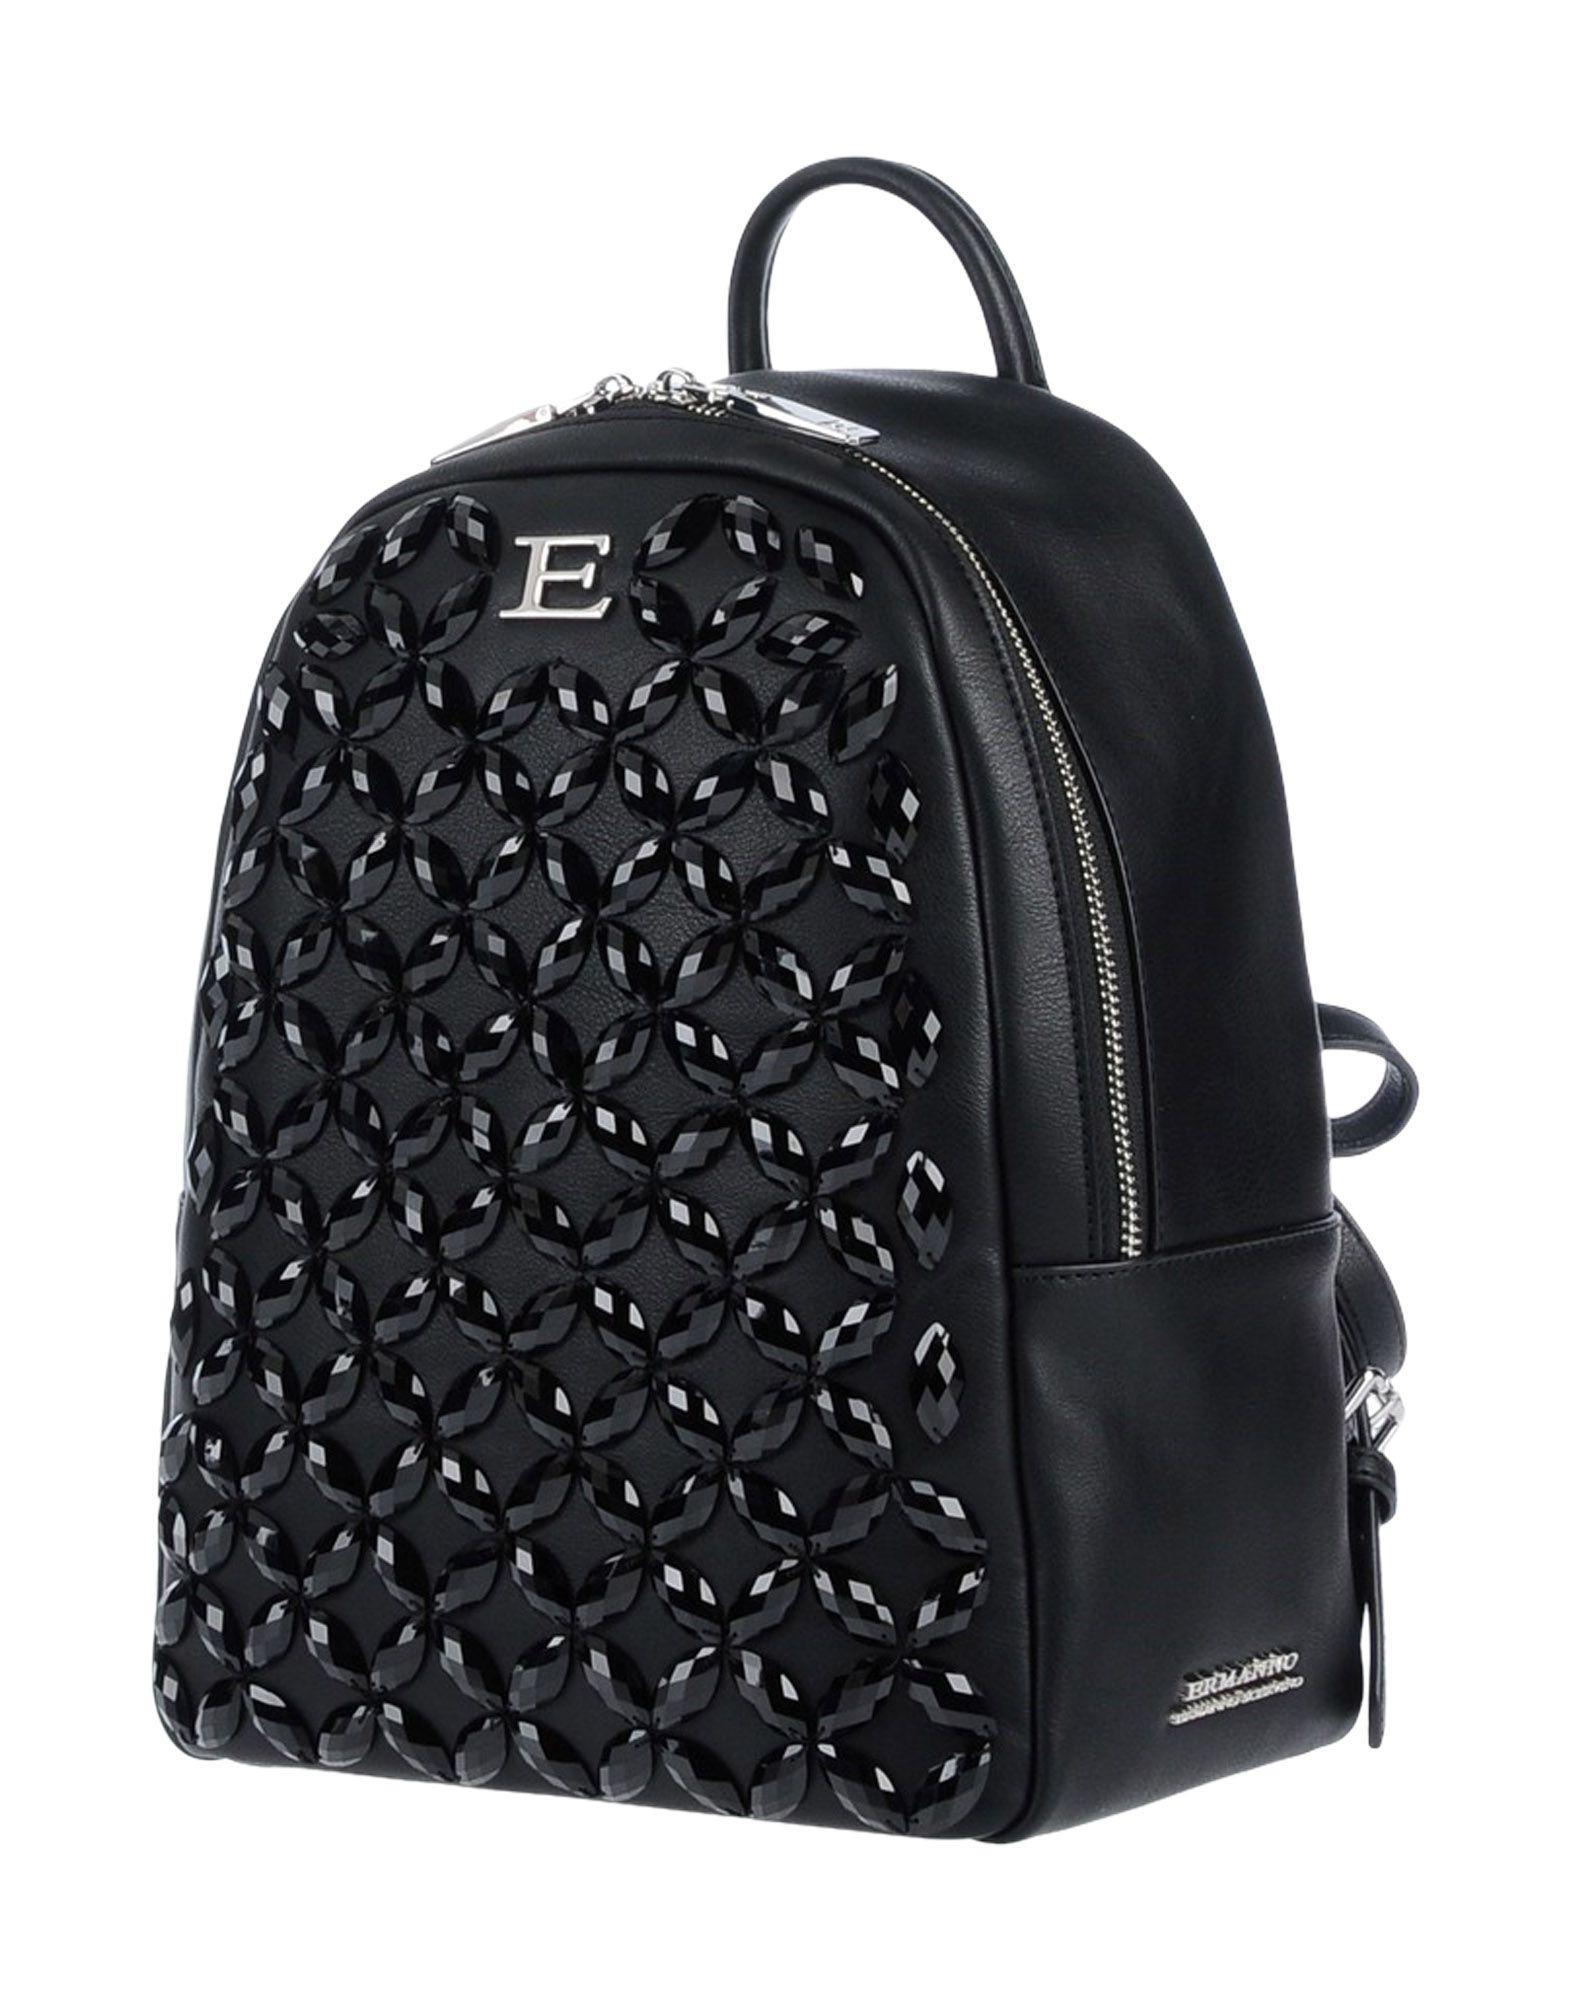 Lyst Ermanno Backpacks Black Scervino Bags amp; In Bum 0Spxqr0